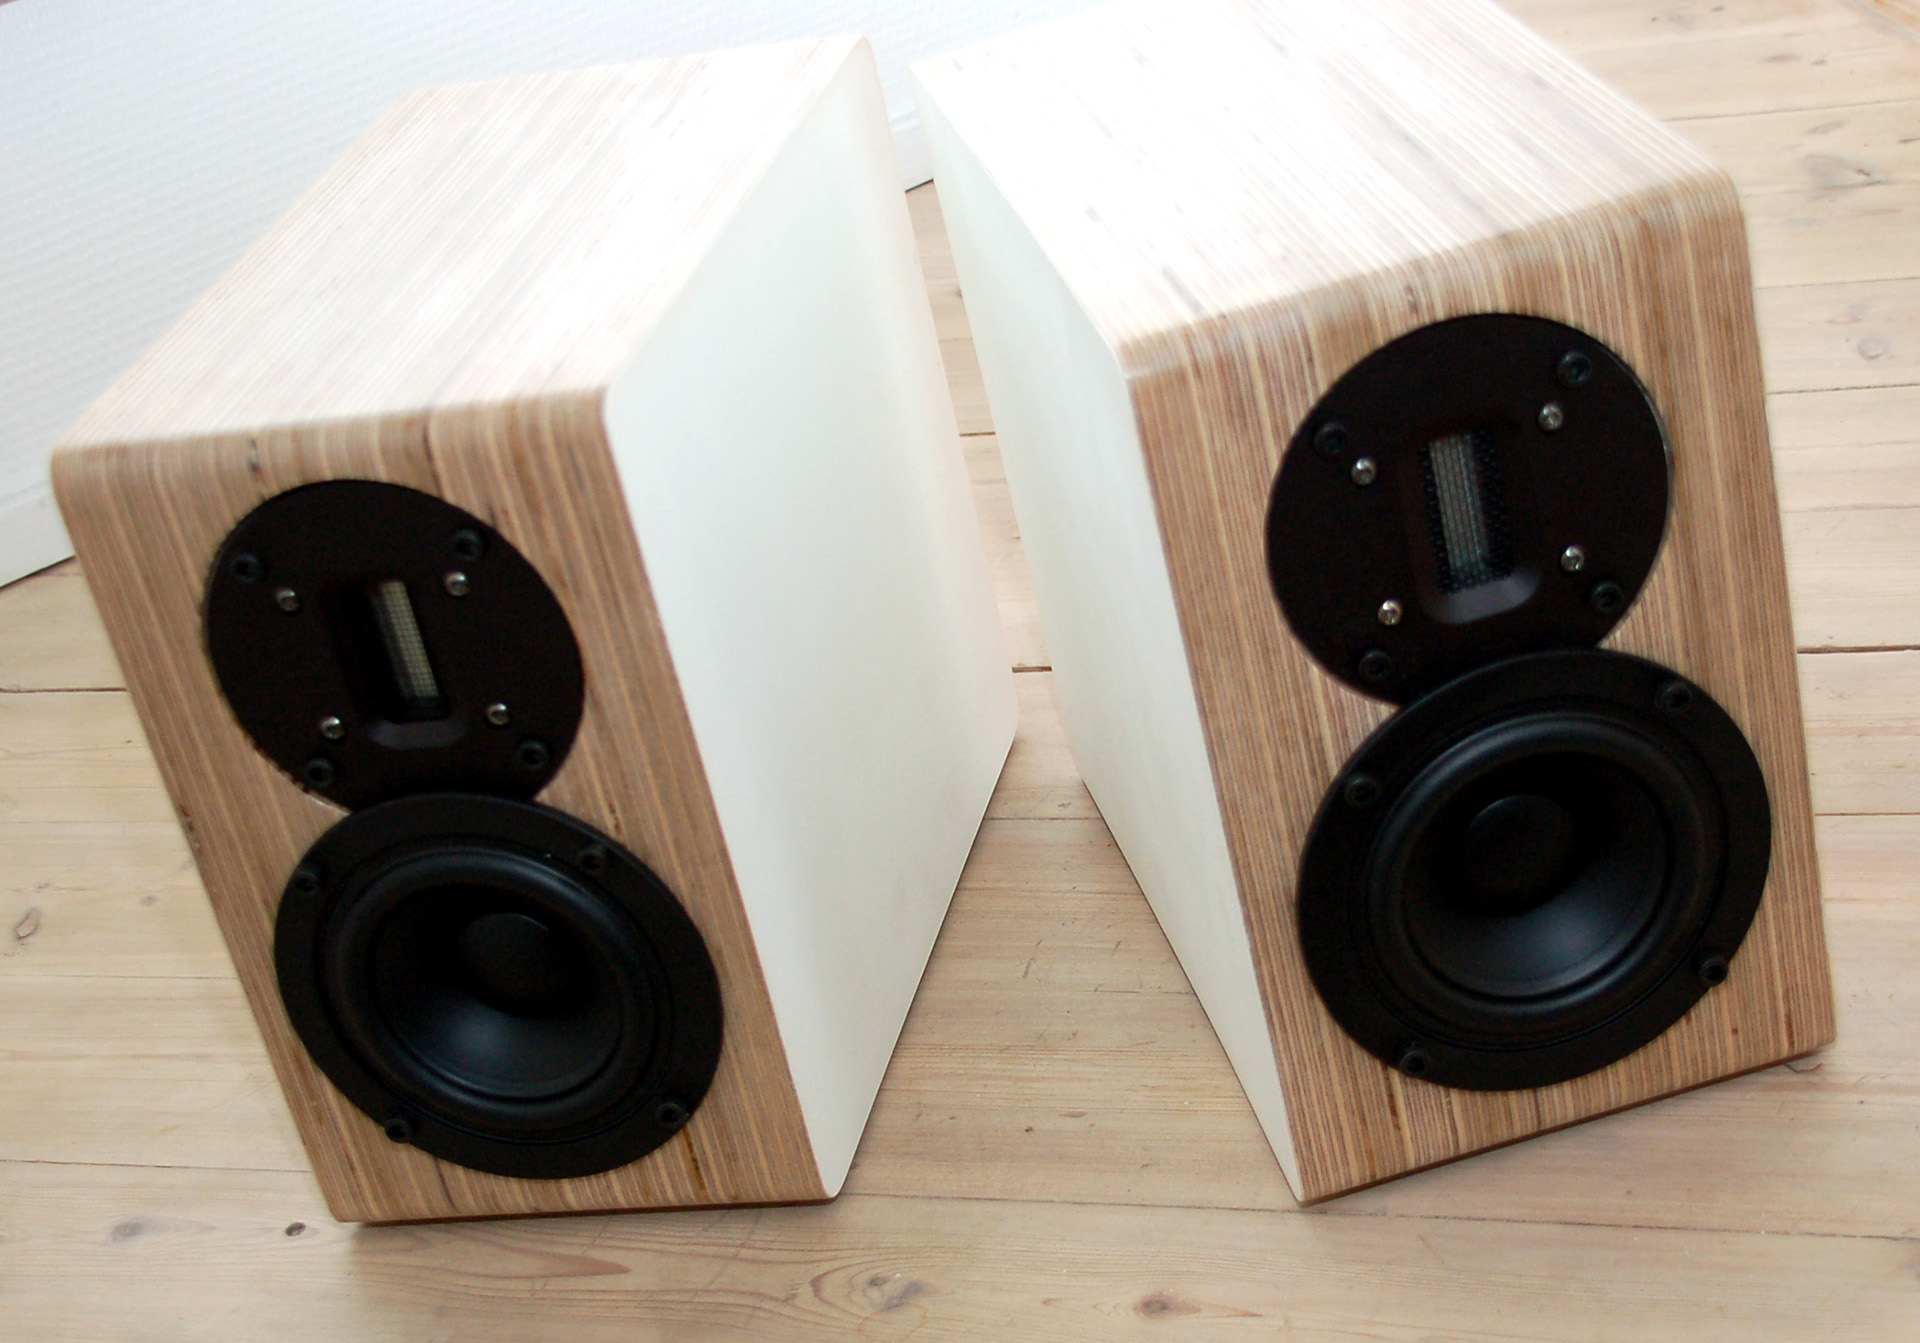 Finished my Speedsters. Finally. - Techtalk Speaker Building